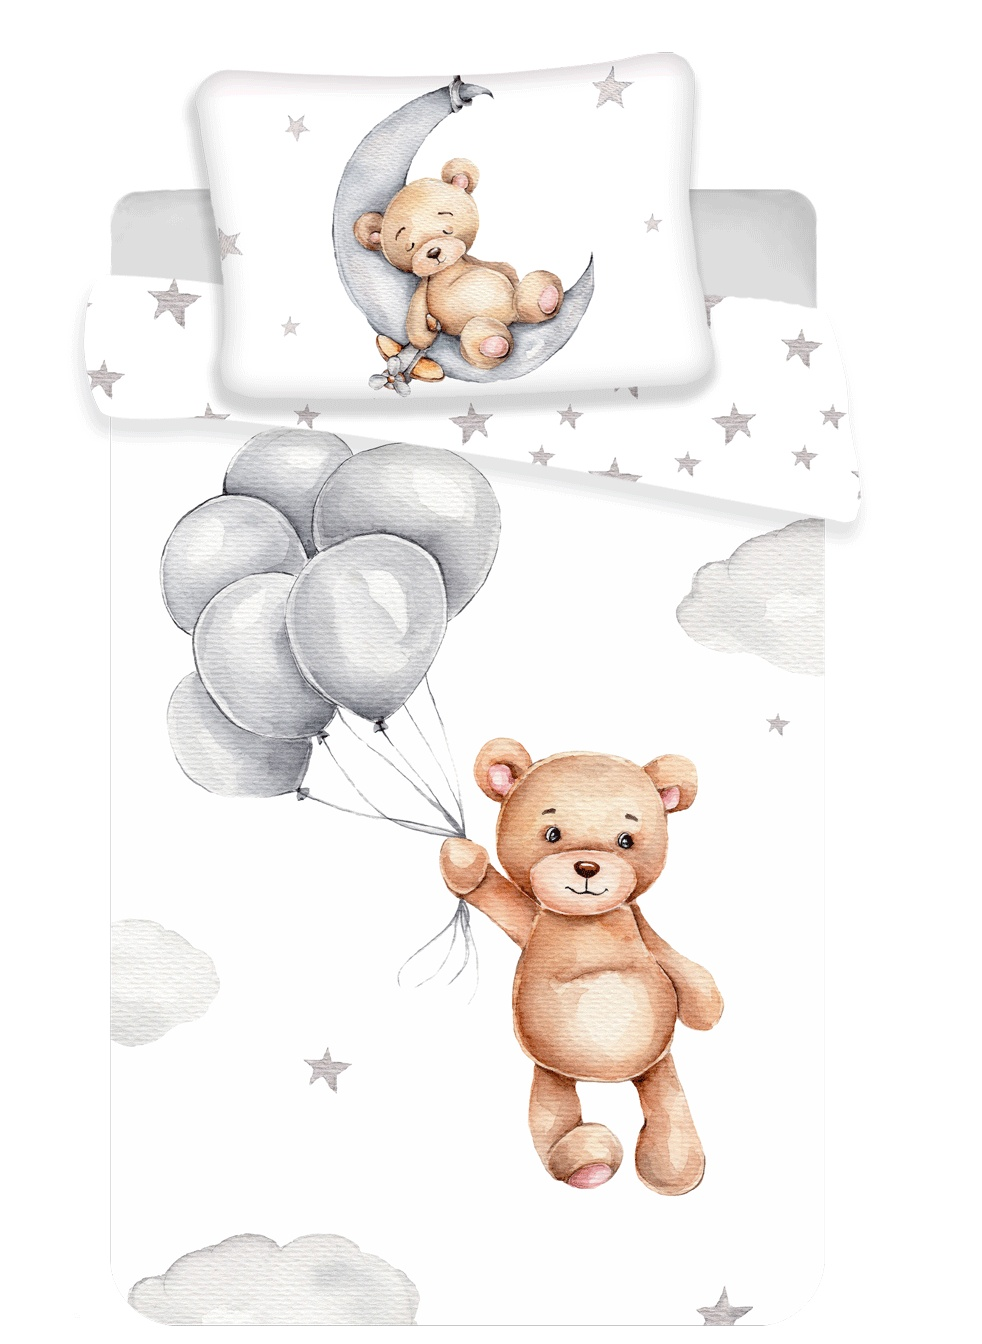 Disney povlečení do postýlky Medvídek baby 100x135, 40x60 cm